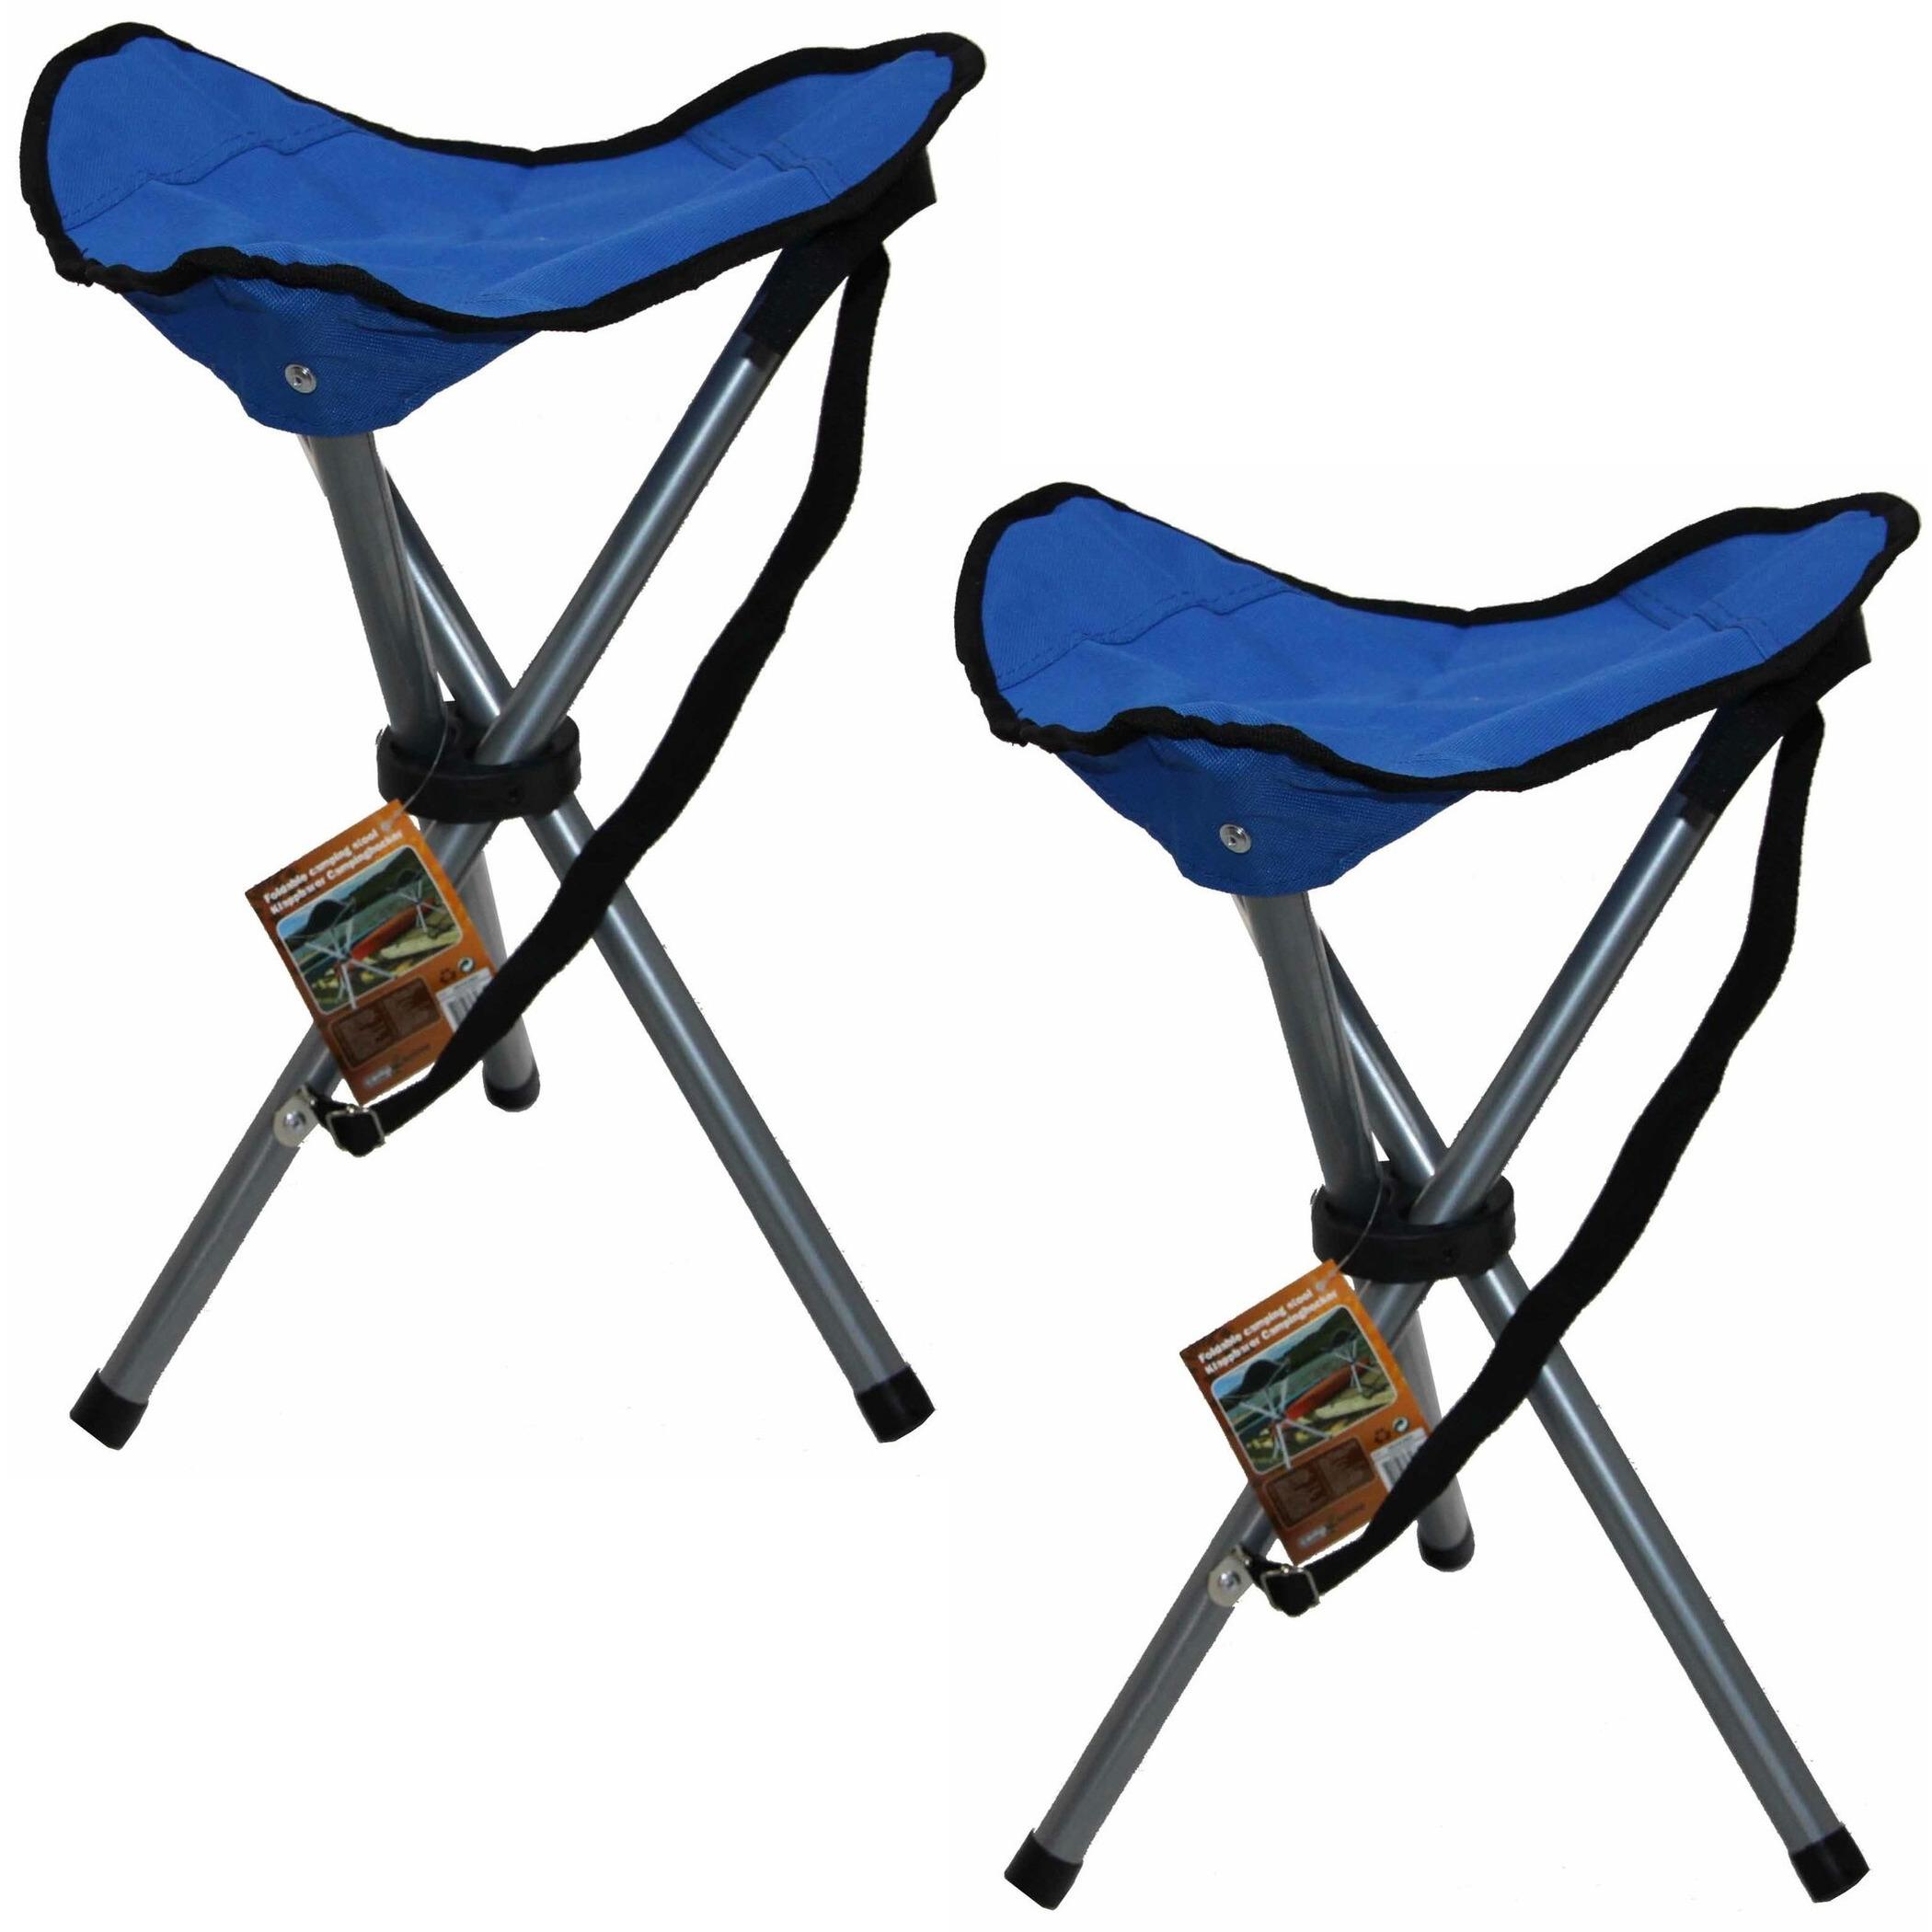 2x blauw opvouwbaar lichtgewicht campingkrukje 31 x 50 cm